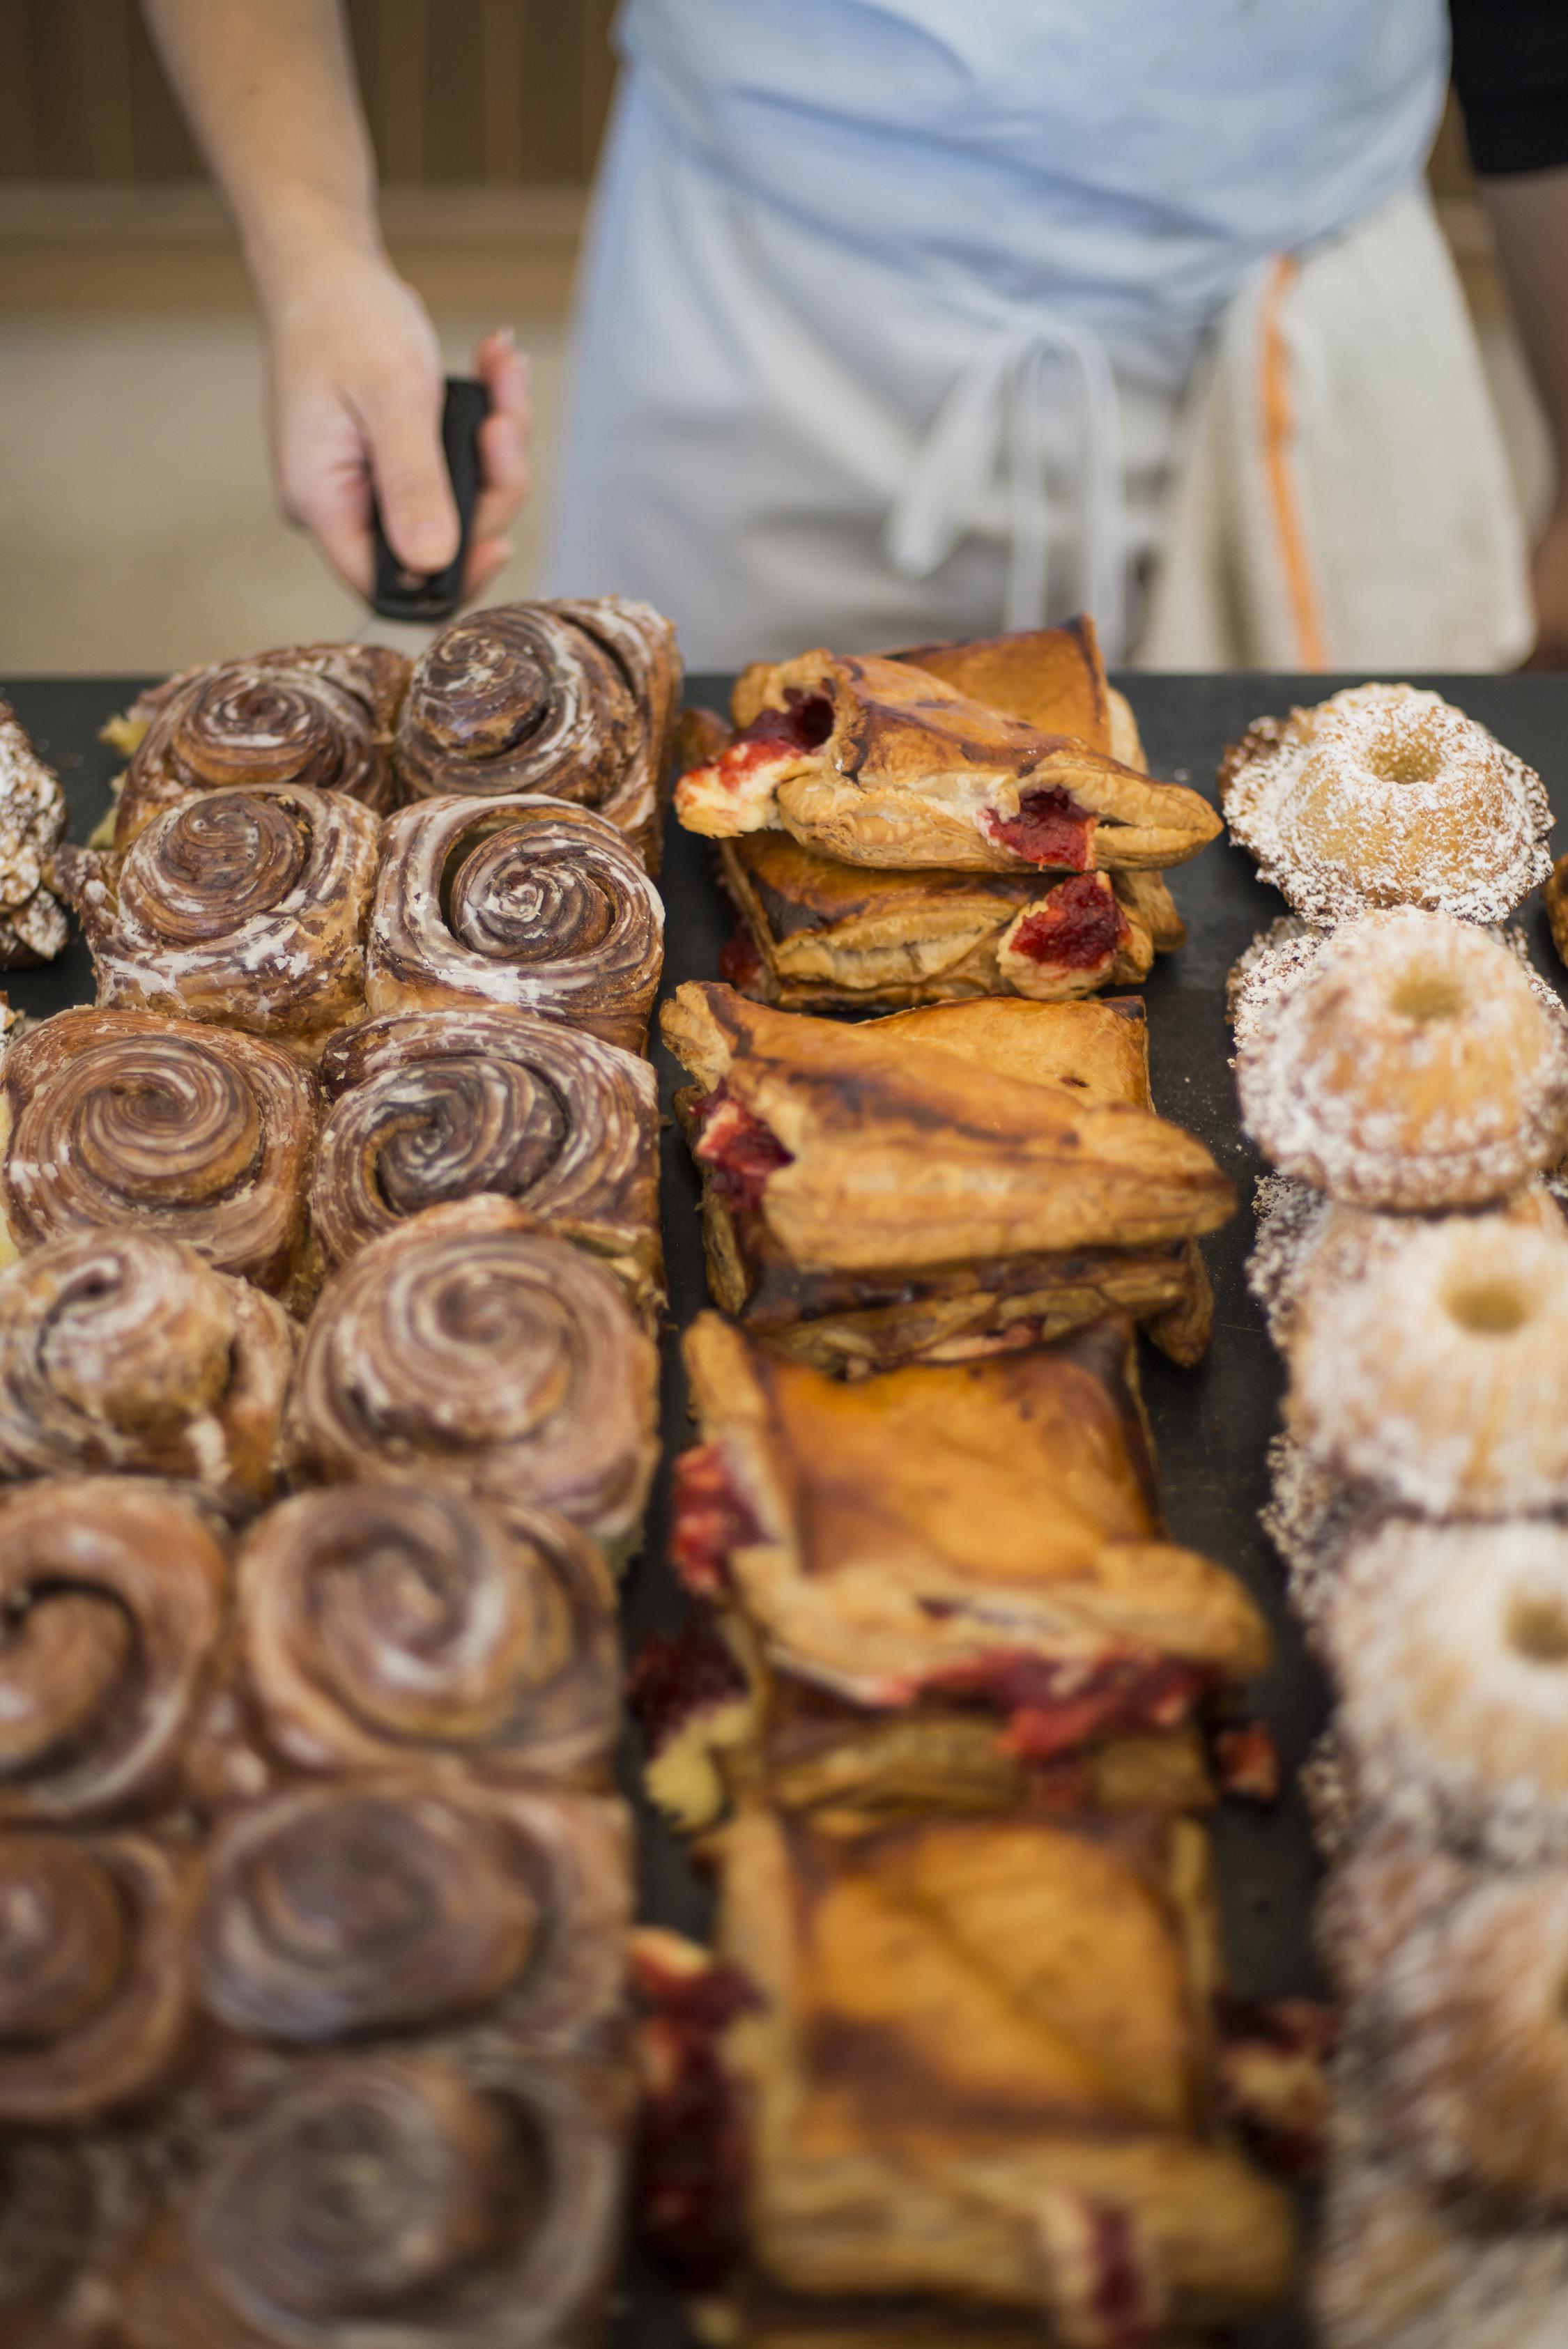 Zak-Stern-Zak-The-Baker-Ashkenazi-Jan-Norris-Felipe-Cuevas-Wynwood-Kosher-Shabbat-405-Deli-Bread-Challah-Israel-Jewish-Whole-Foods-Chocolate-Babka-Fort-Lauderdale-Venice-Magazine-Cinnamon-Rolls-Guava-Cheese-Pastry